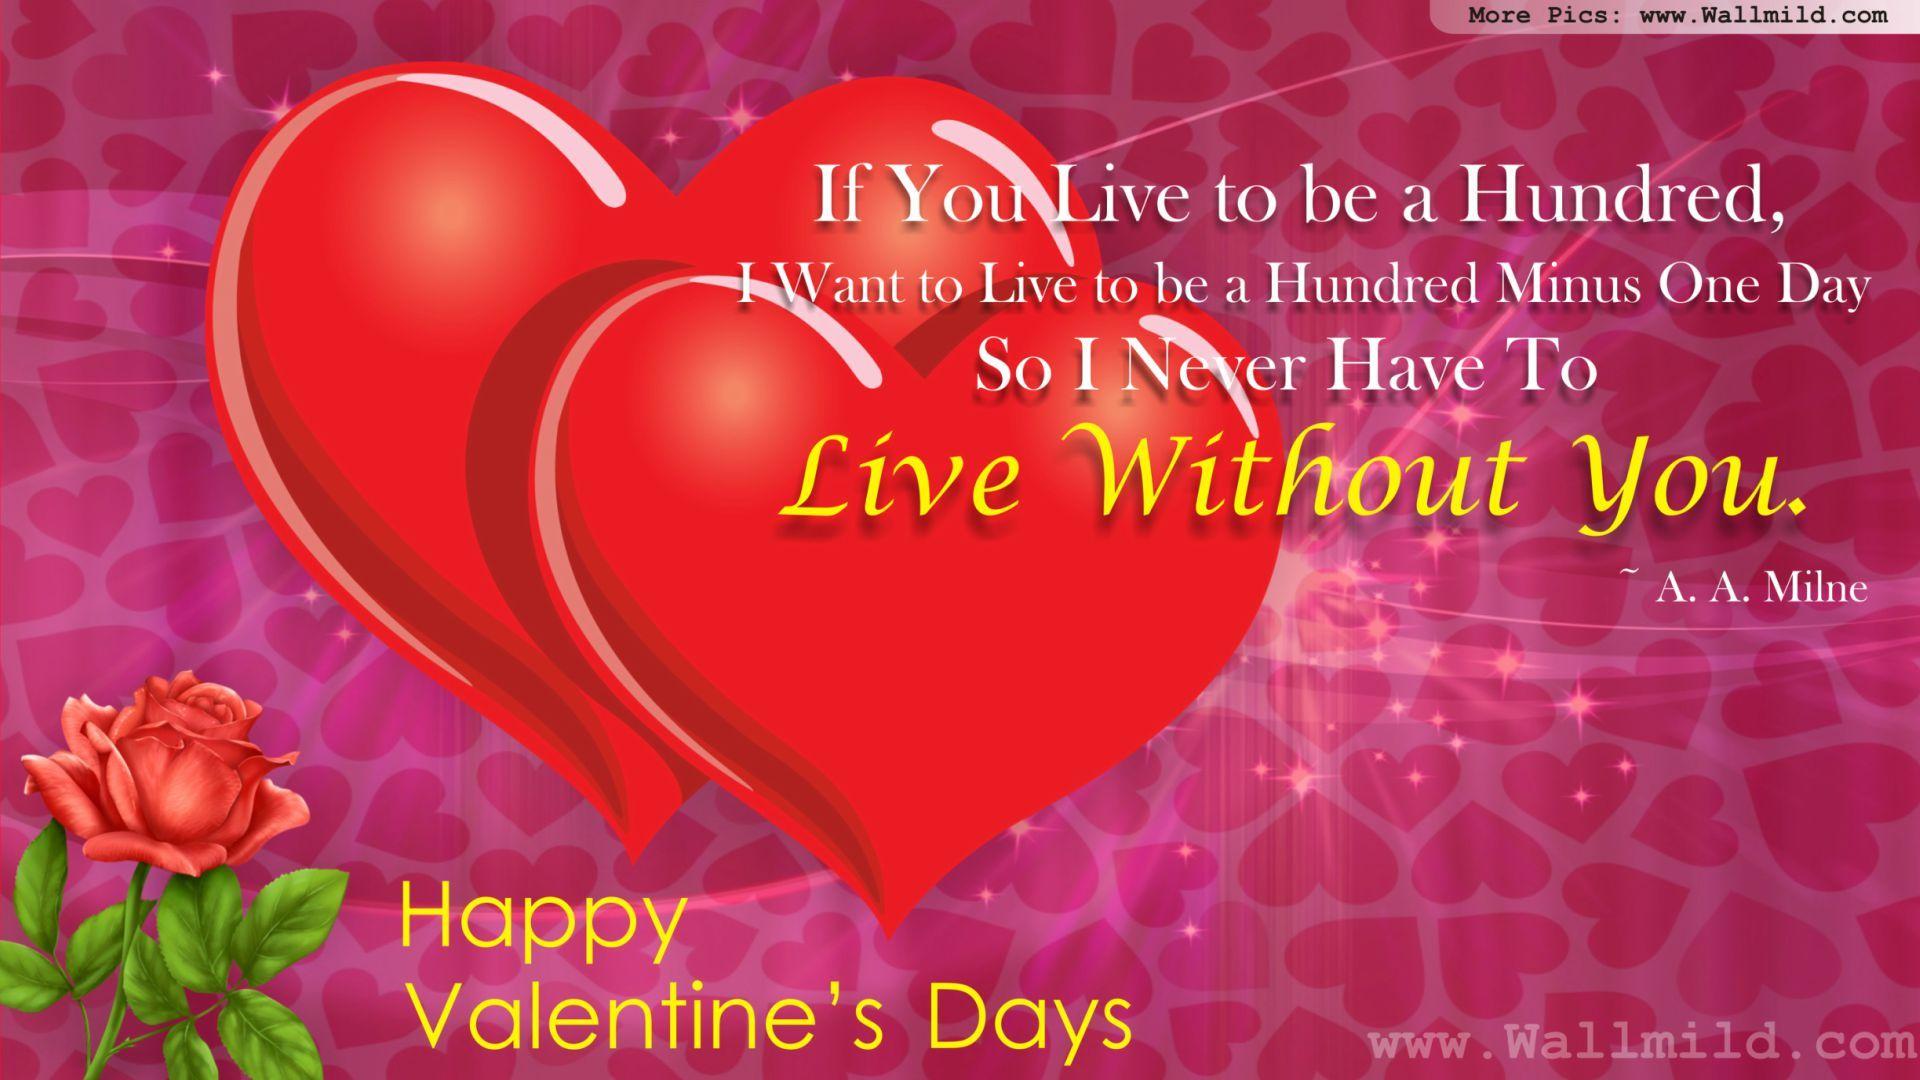 Explore Valentine Love Quotes Valentine Images And More